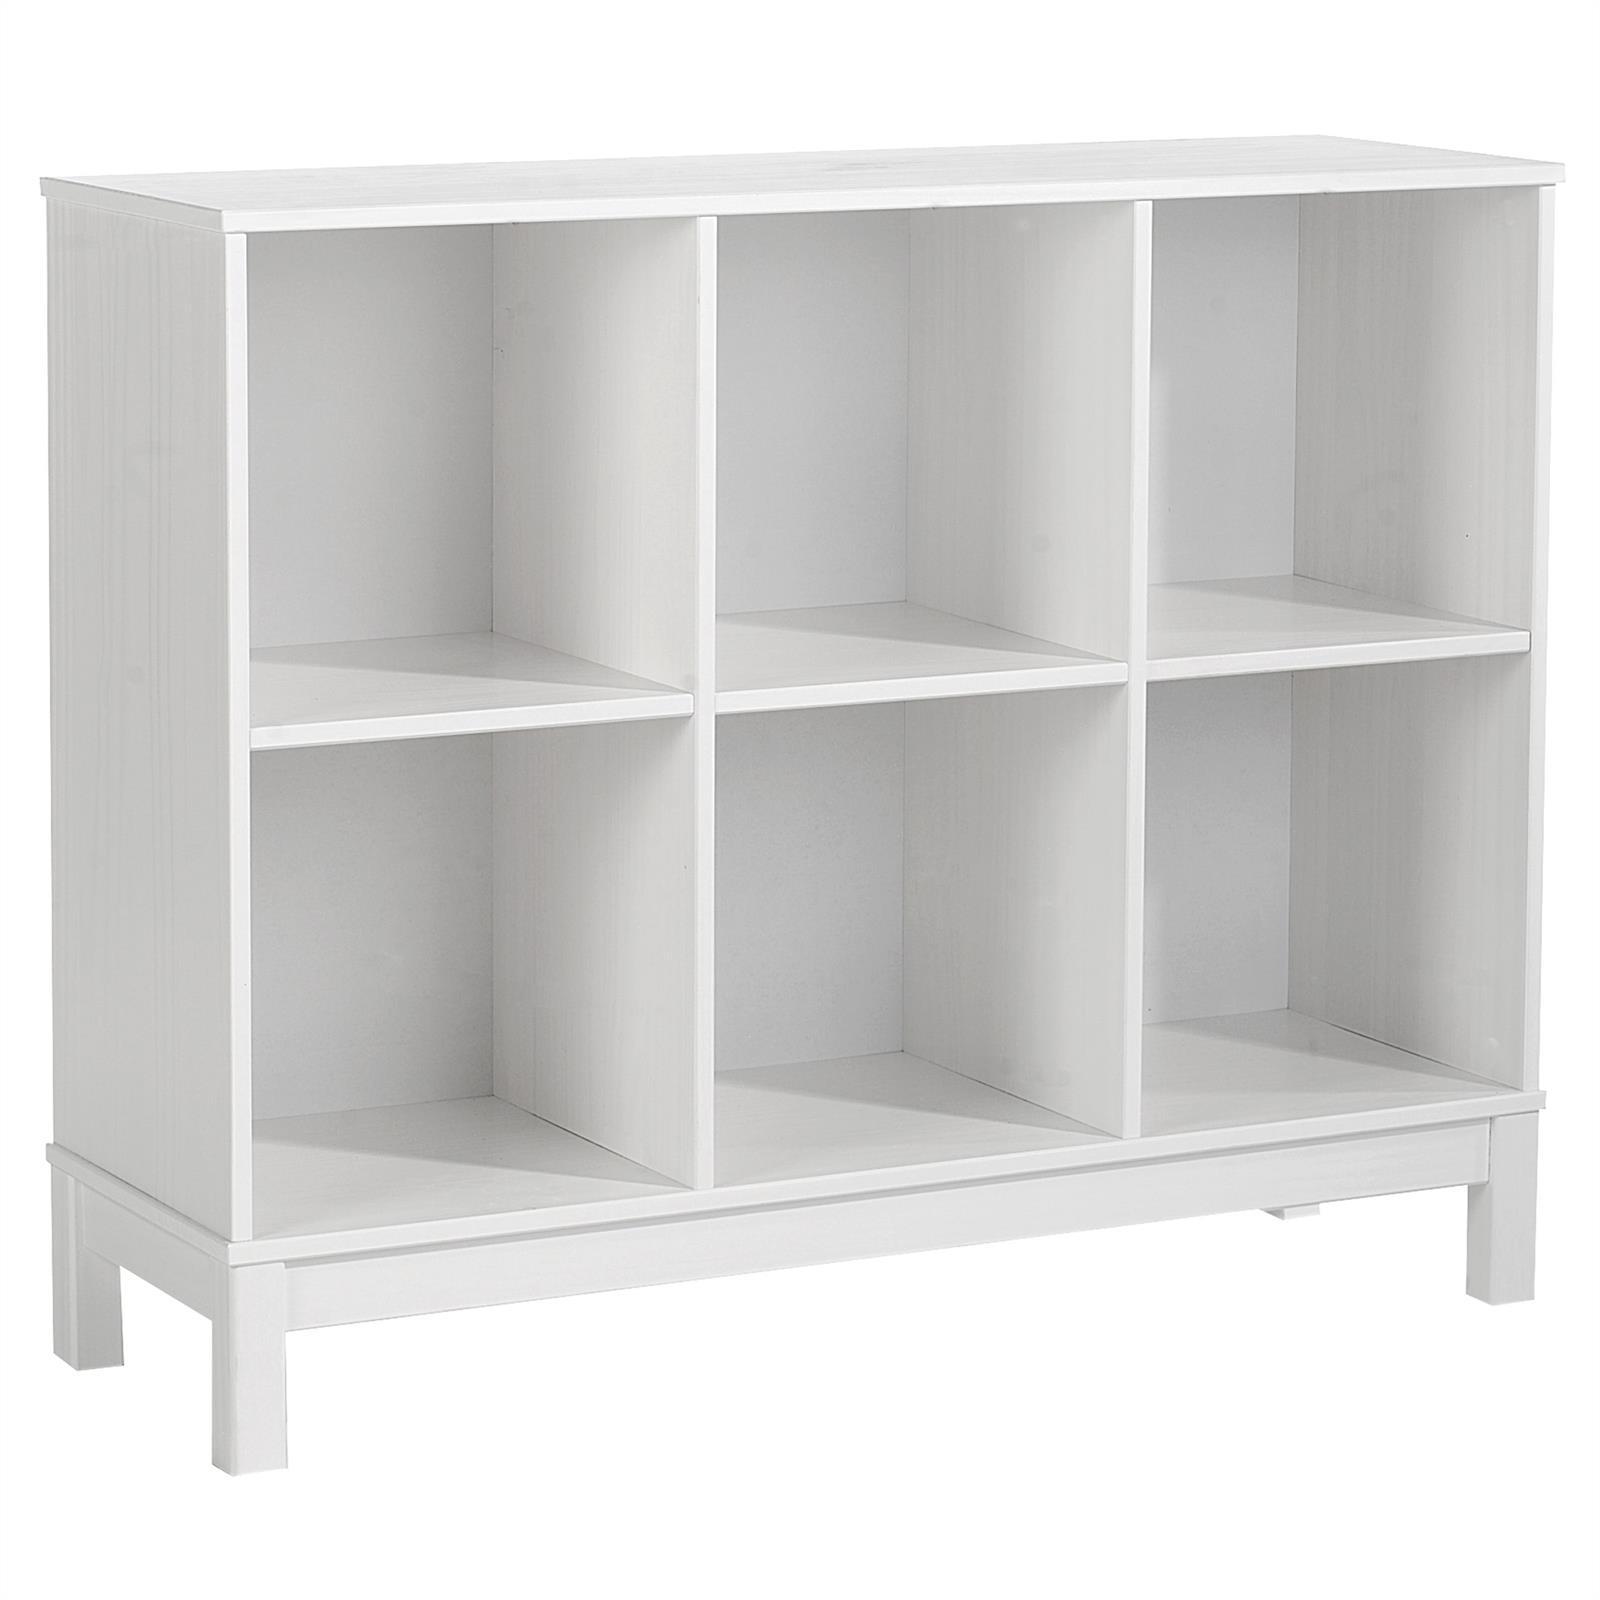 regal standregal b cherregal b roregal holzregal 6 f cher kiefer massiv lackiert ebay. Black Bedroom Furniture Sets. Home Design Ideas